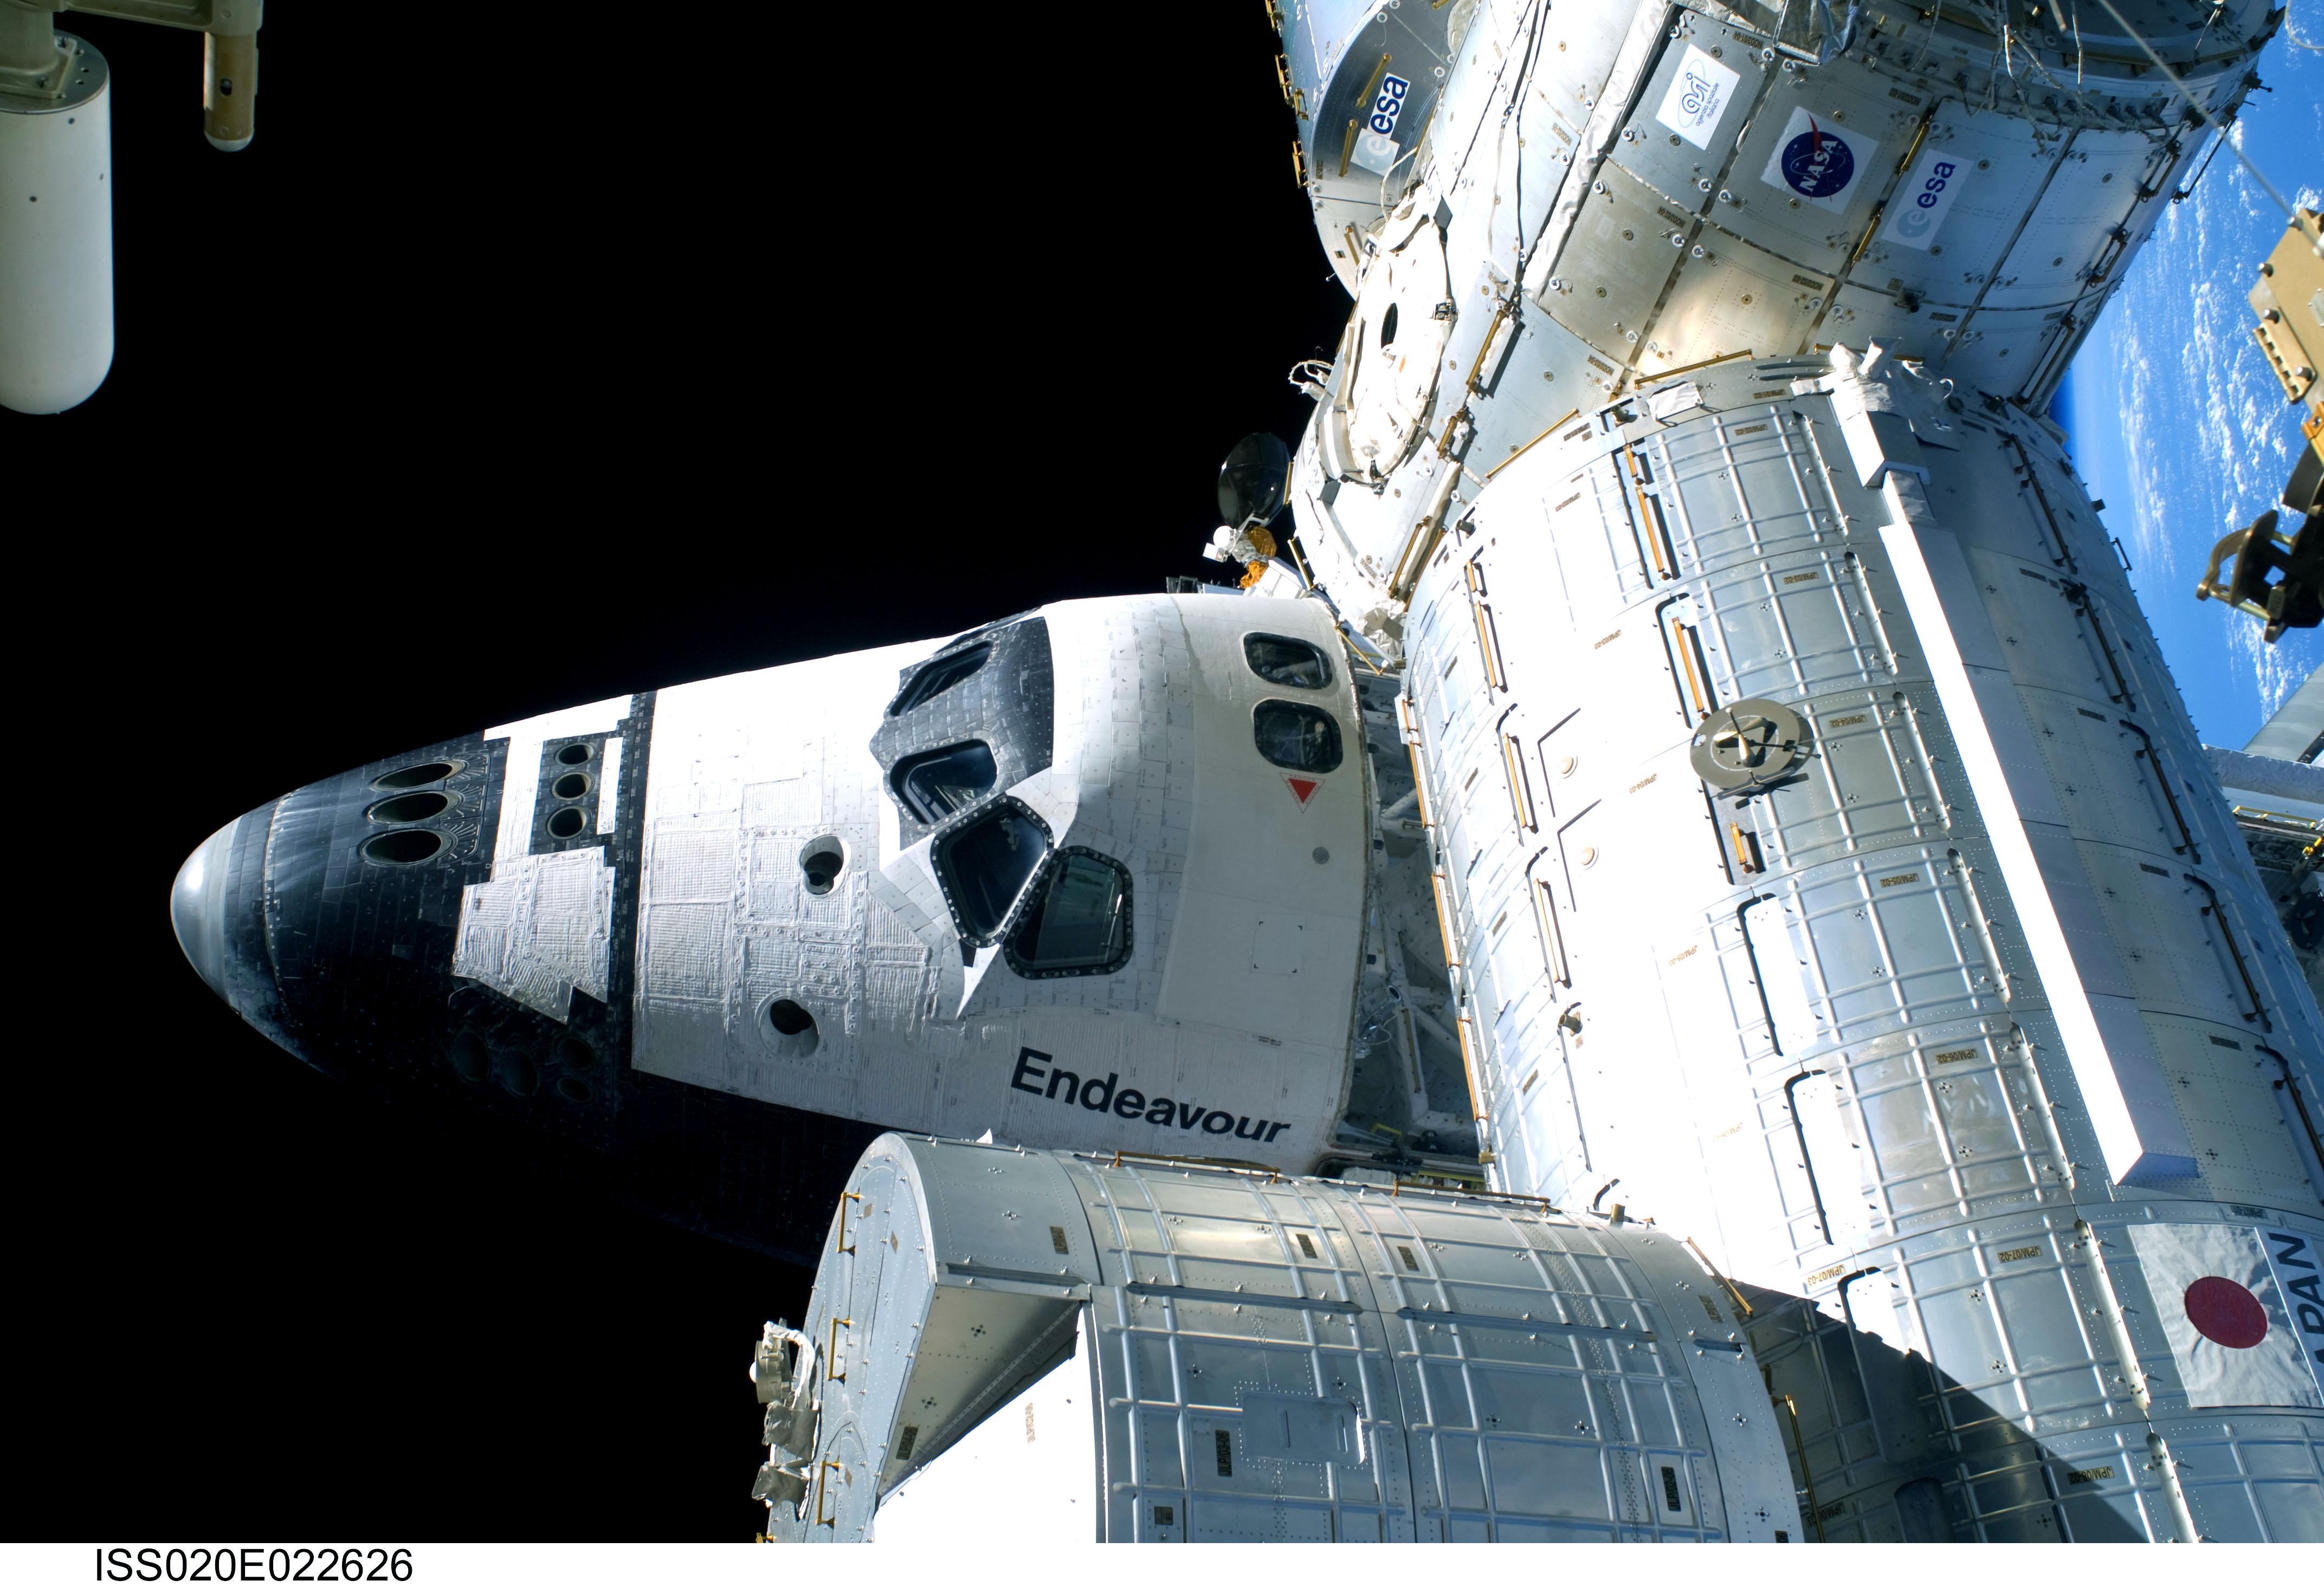 space shuttle endeavour simulator ride - photo #38